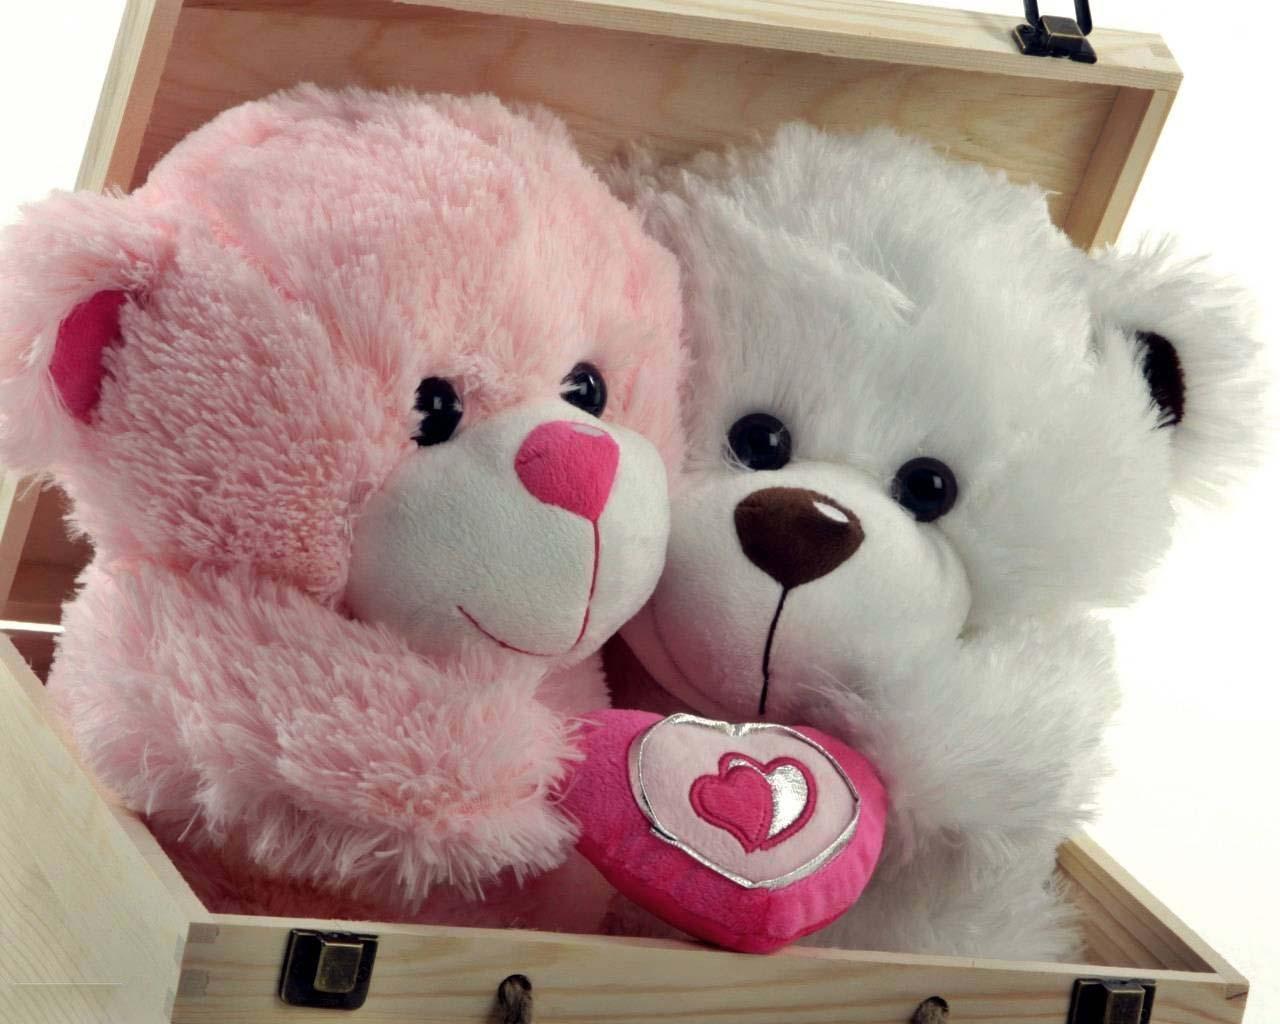 Love Quotes With Teddy Bear Images: صور عن الحب والغرام صور حب رومانسية جميلة